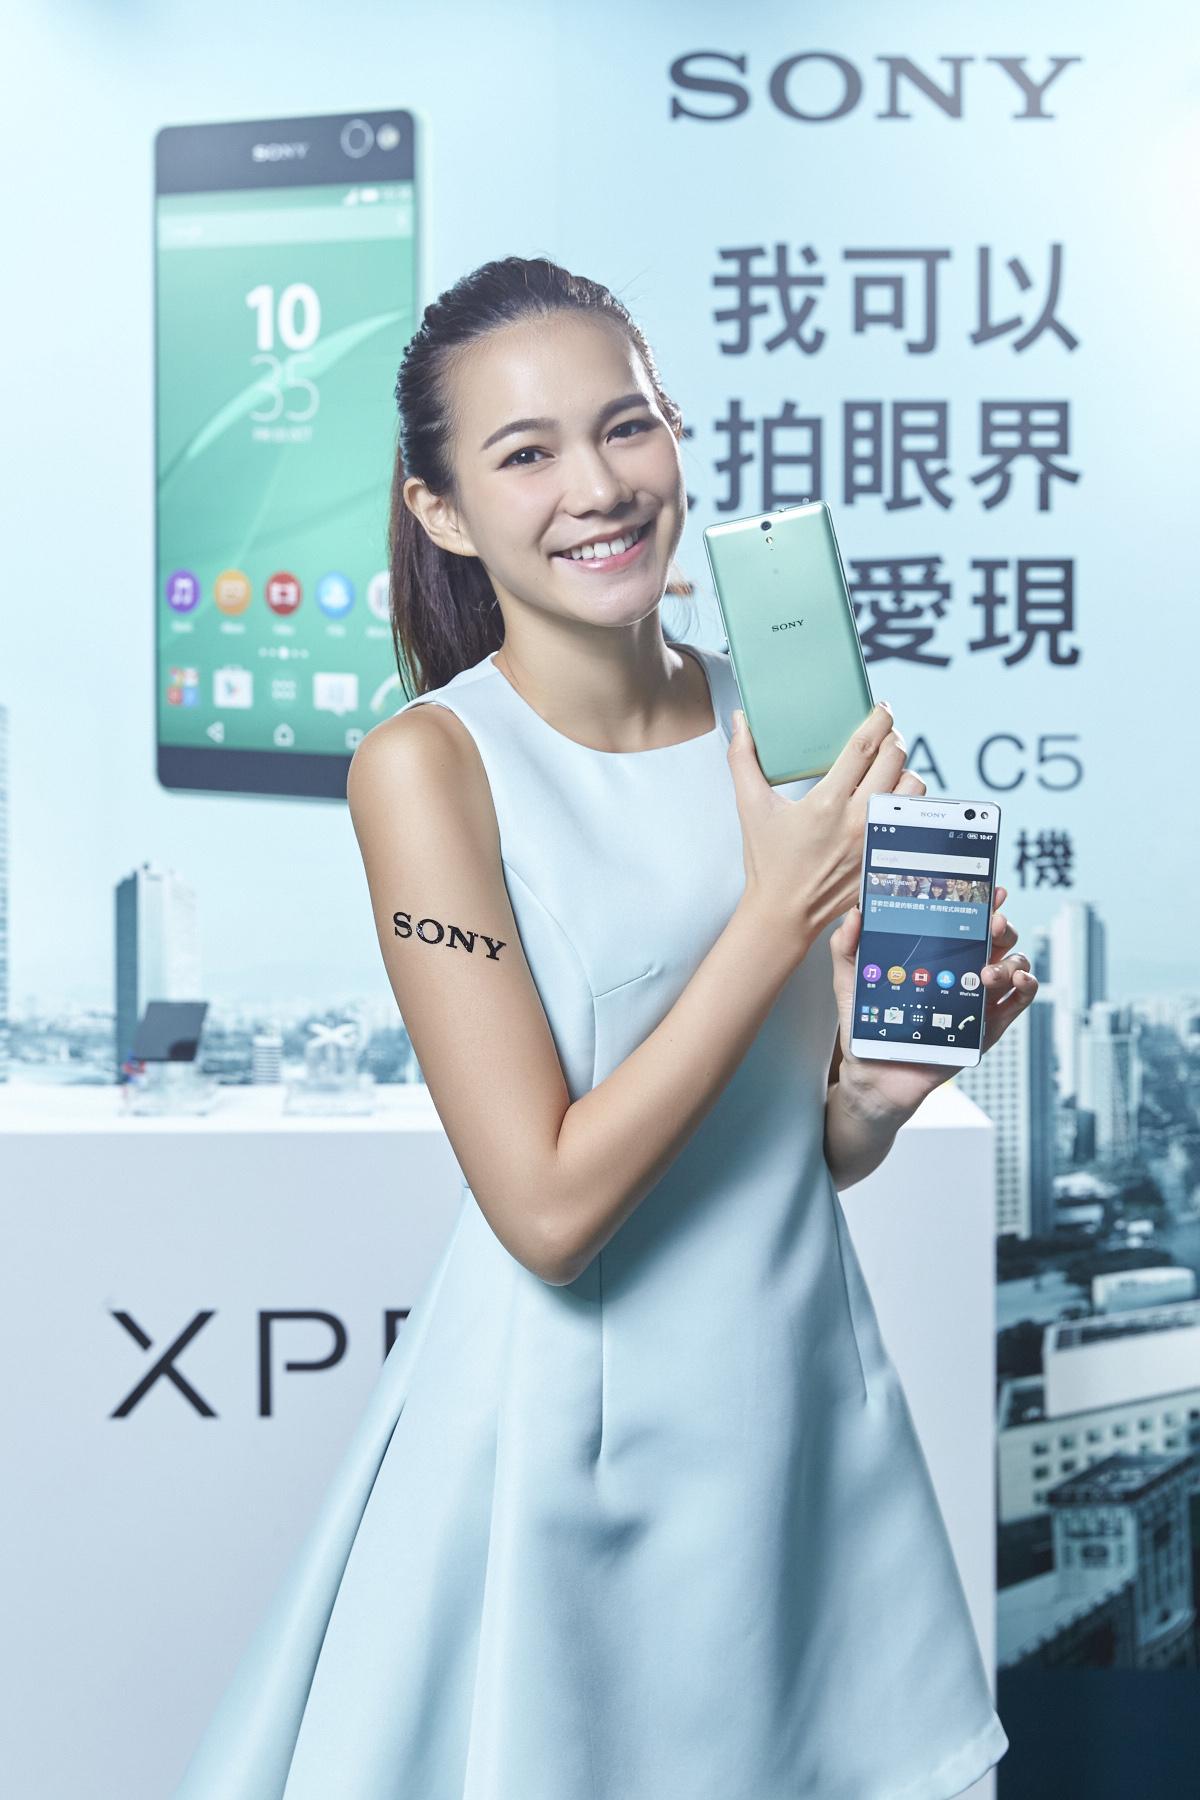 Xperia C5 Ultra以大螢幕搭配創新極窄邊框,前後相機皆為1300萬畫素